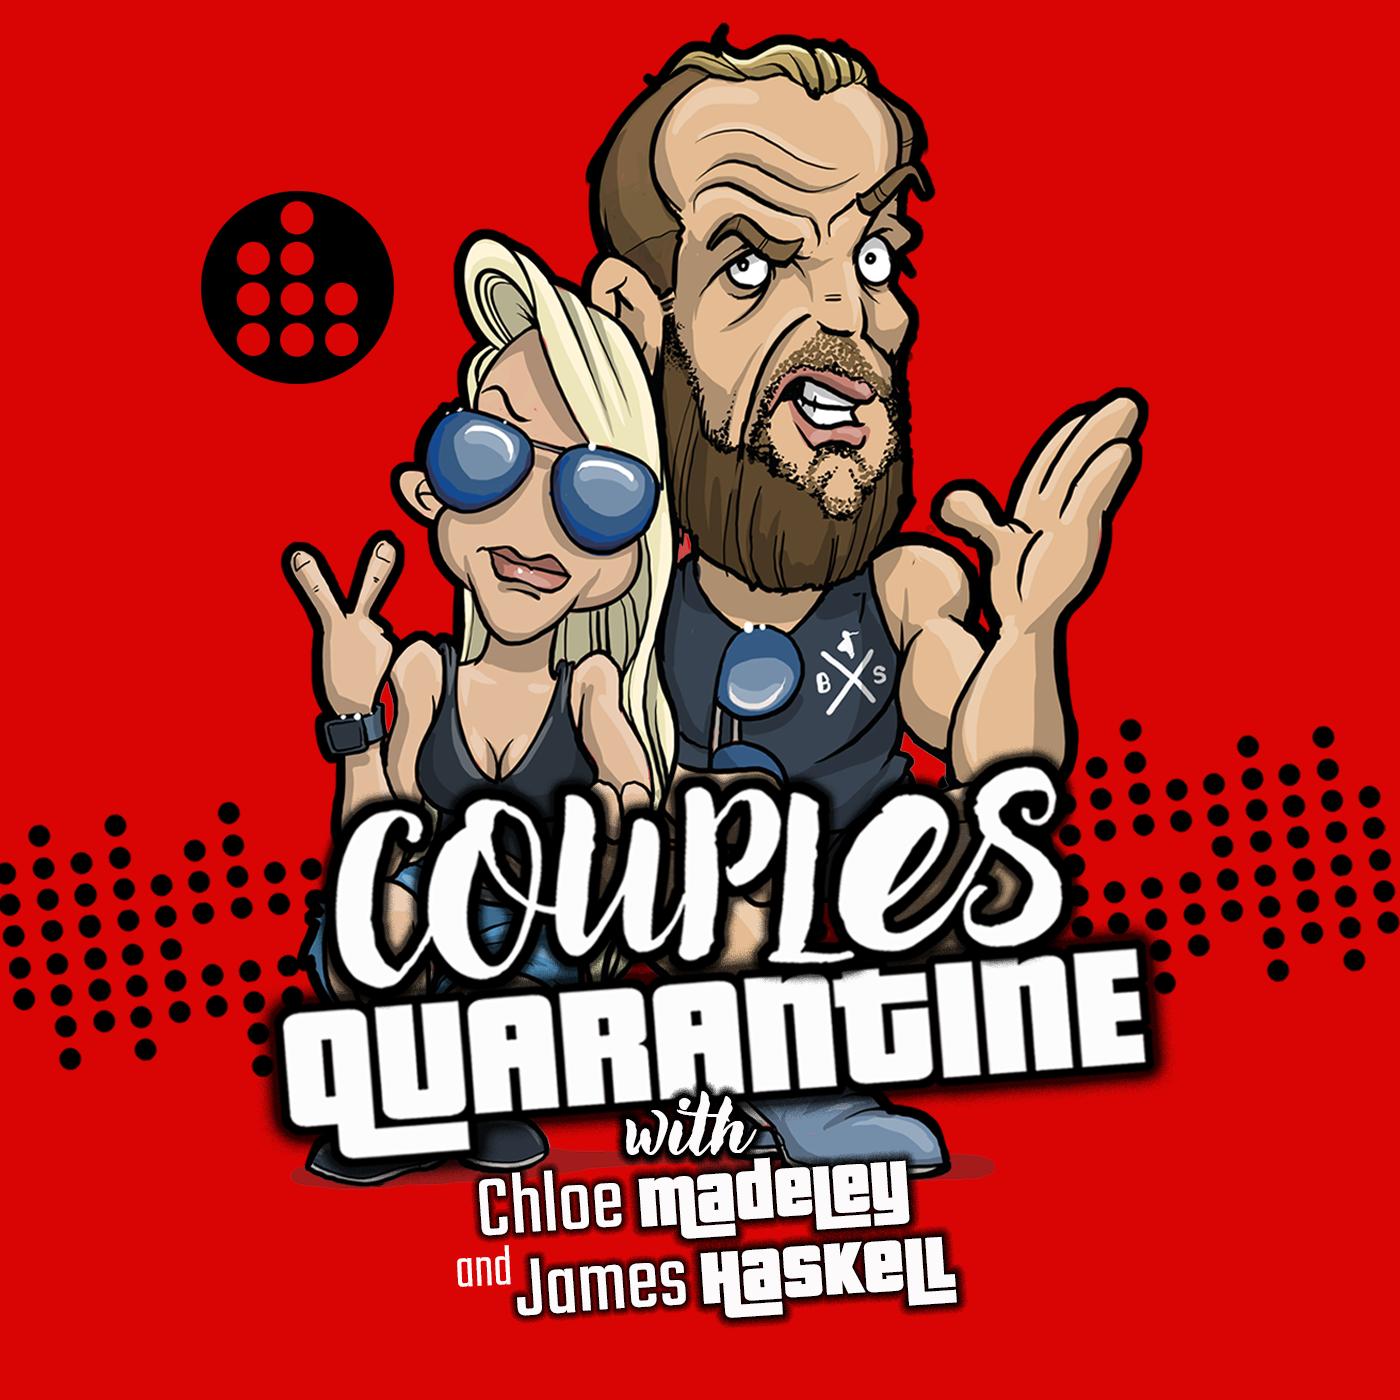 @CouplesQuarantine Profile Image | Linktree